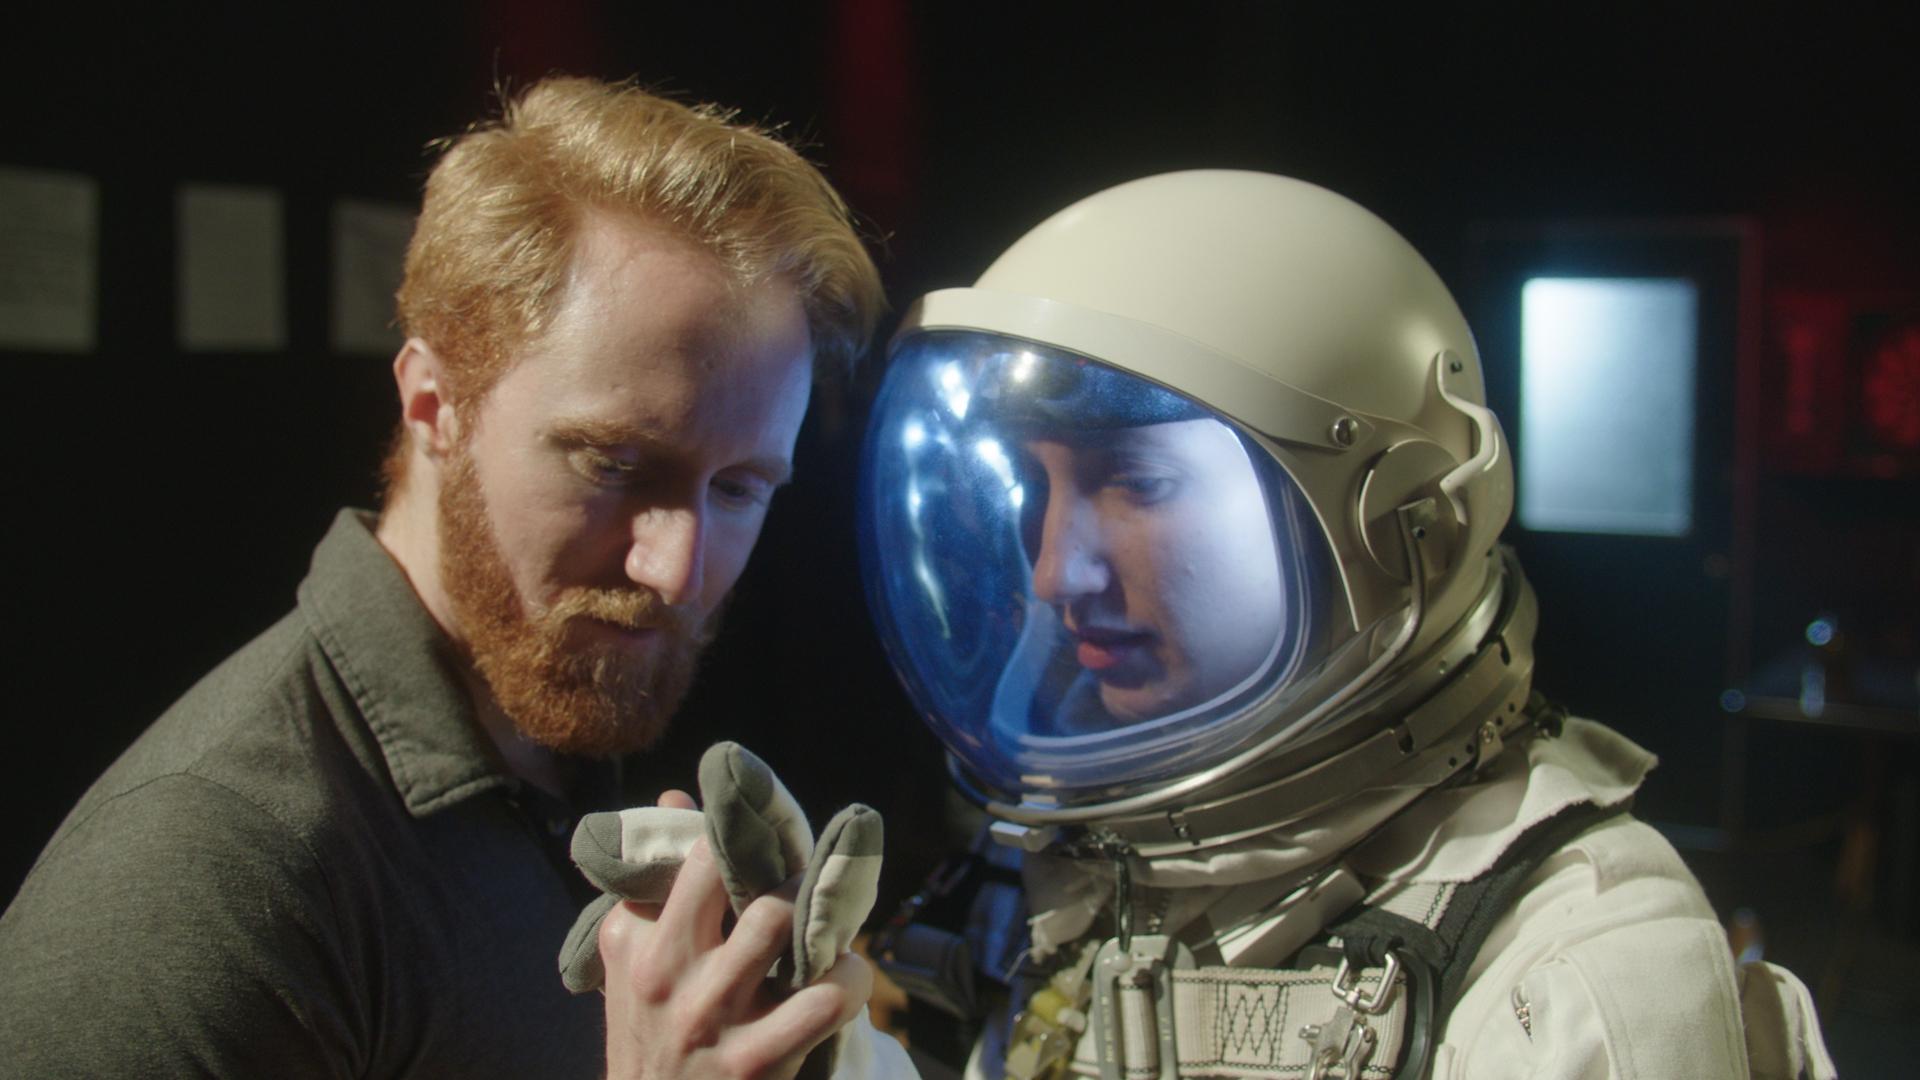 Astral (2020) by Morgan Montgomery